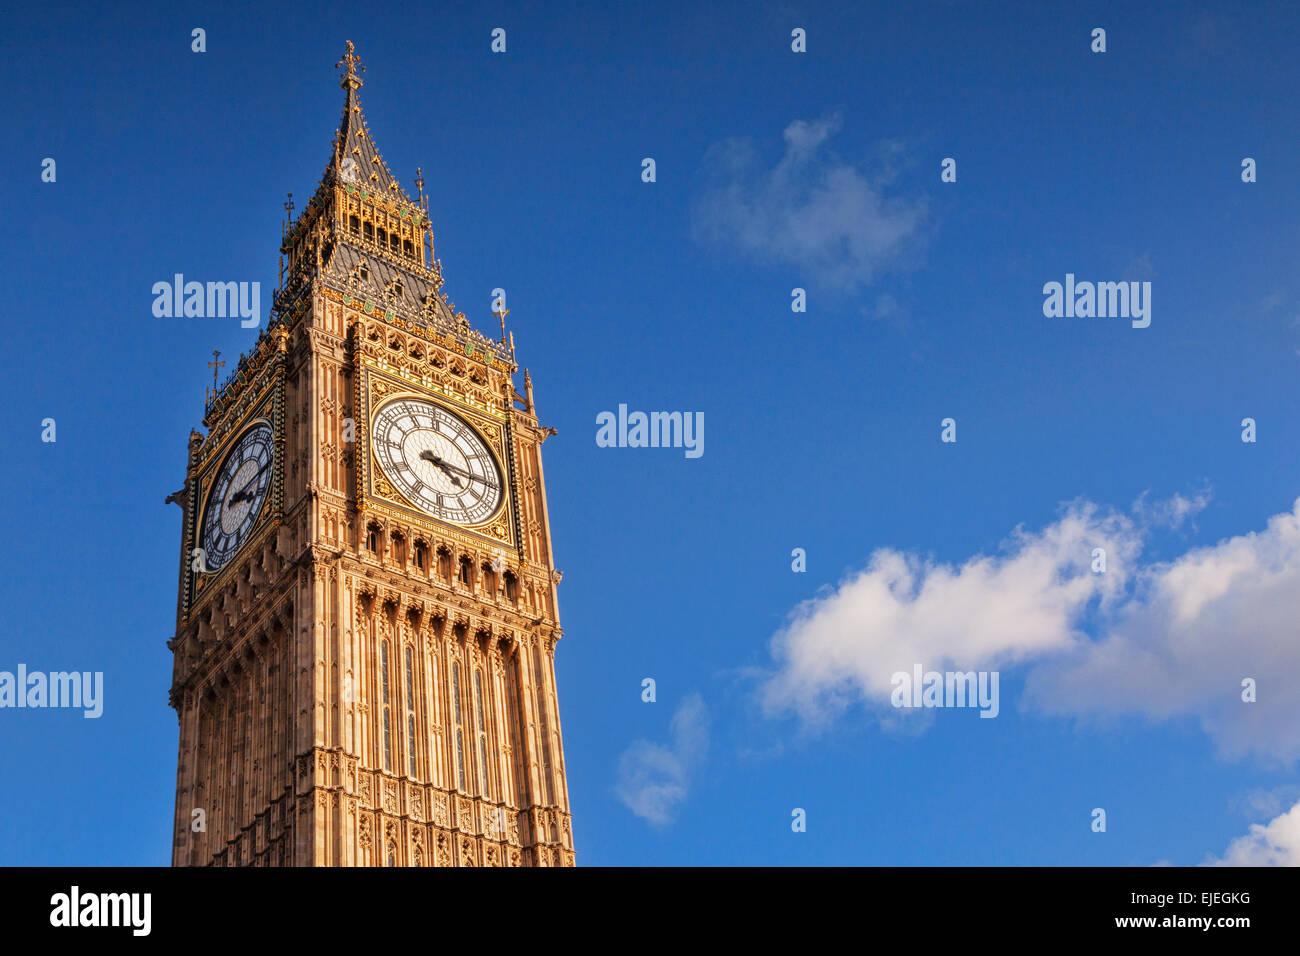 Big Ben, Westminster, London, England. - Stock Image